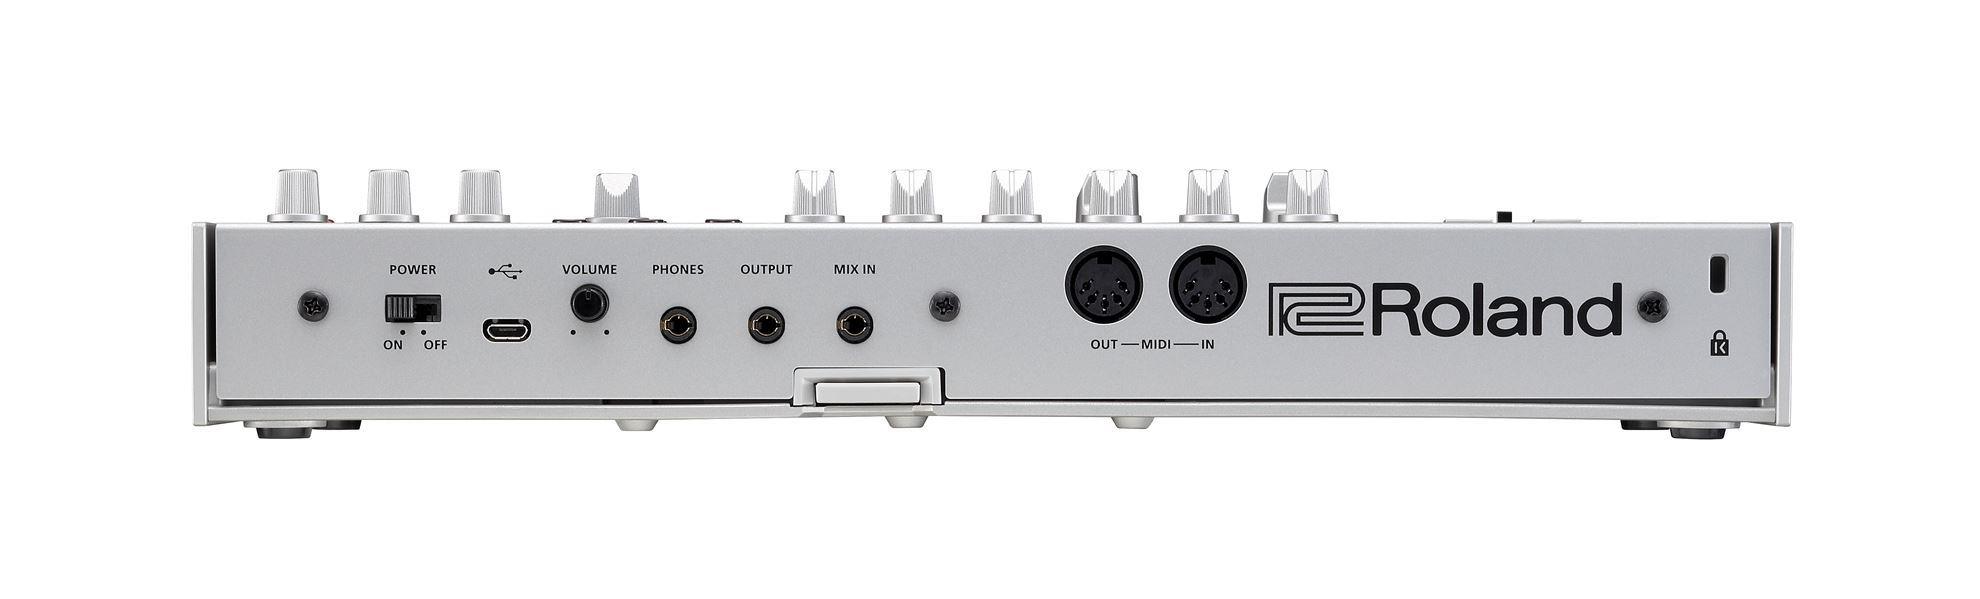 Roland TR-06 Drumatix Module - Rear